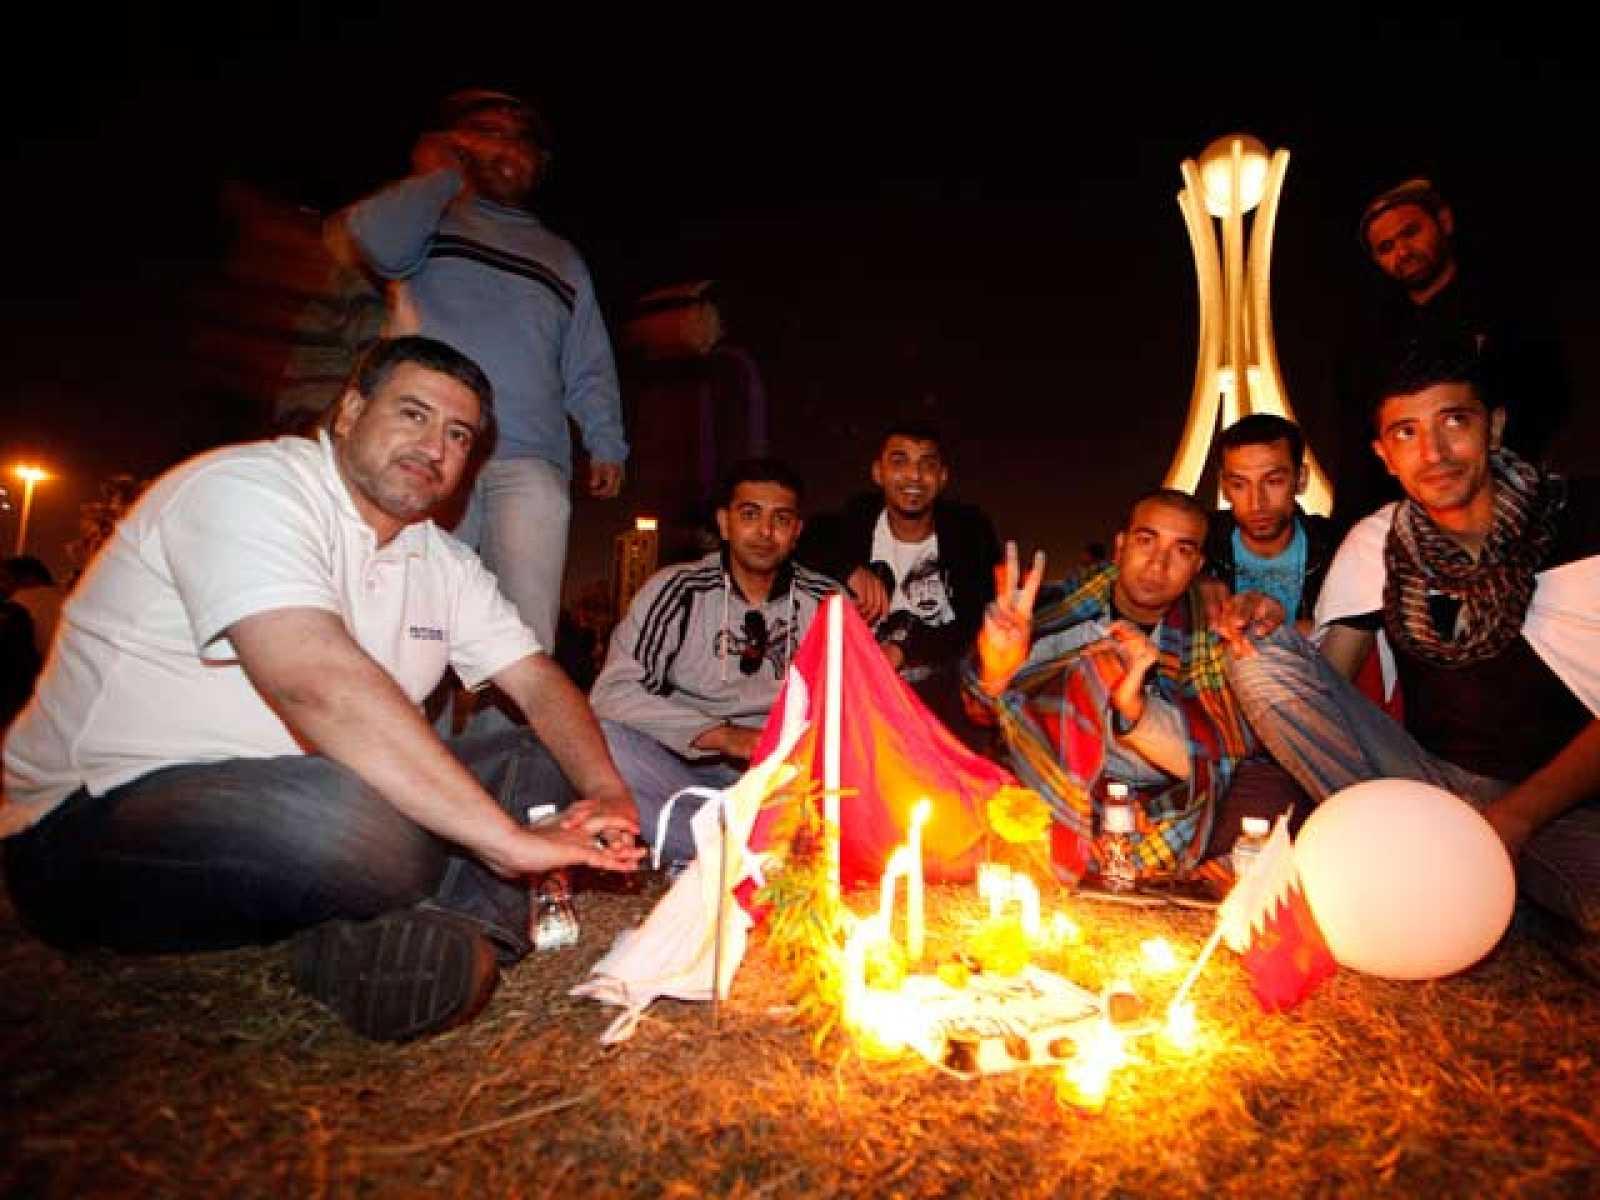 Las protestas en Barhéim han seguido este sábado